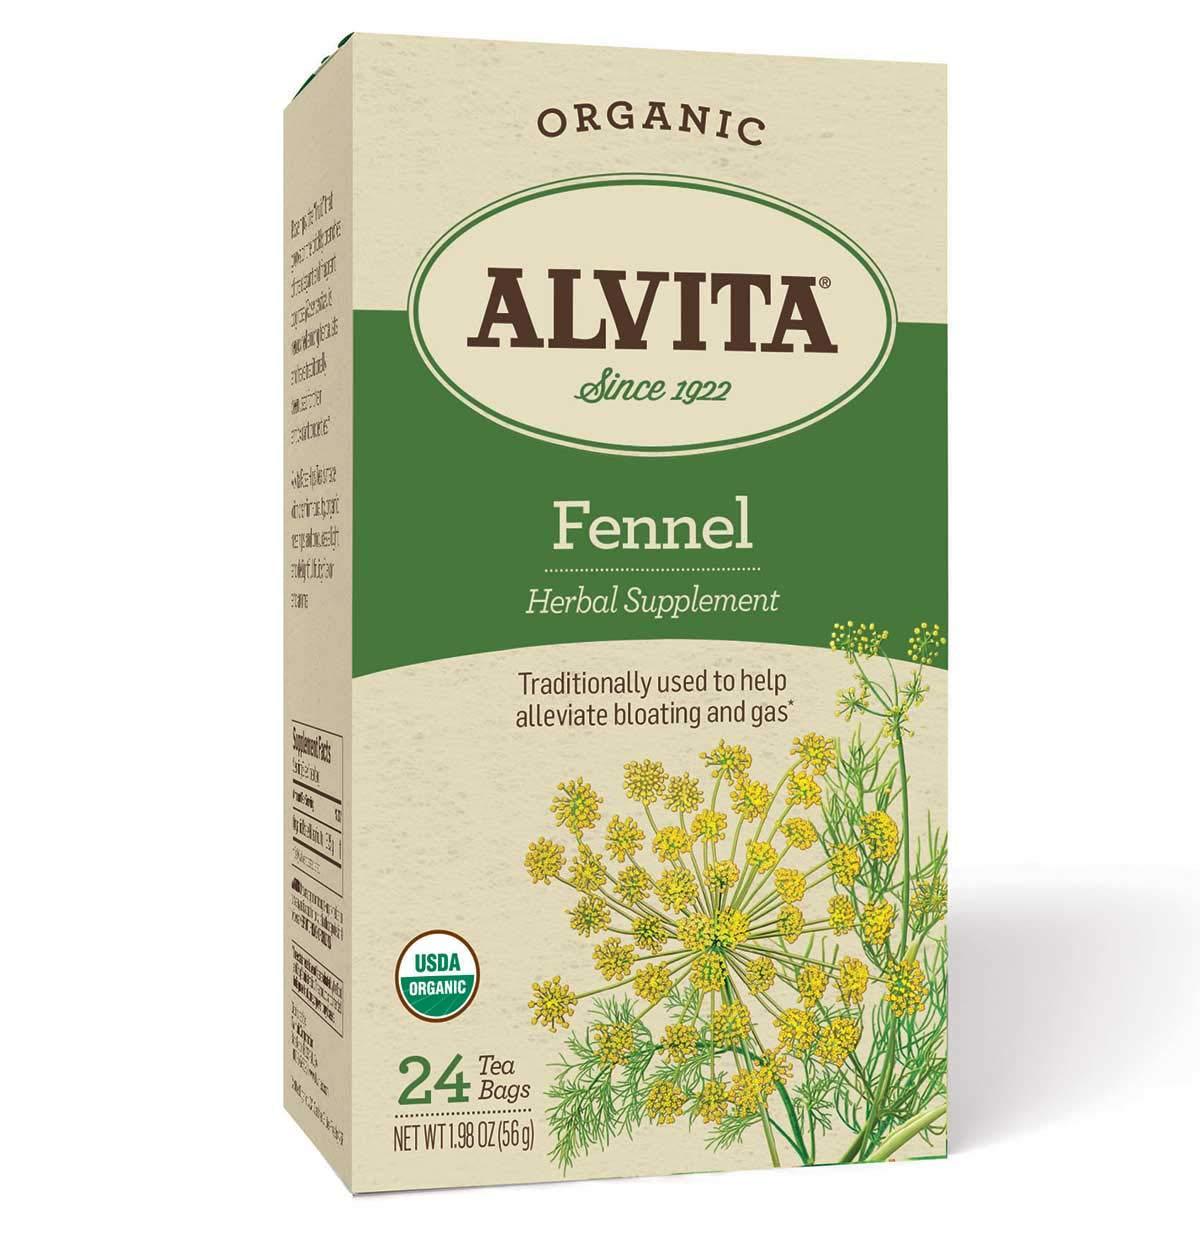 Alvita Organic Herbal Tea 24 Box Fennel 贈り物 Teabags Multipack Per 人気ブレゼント